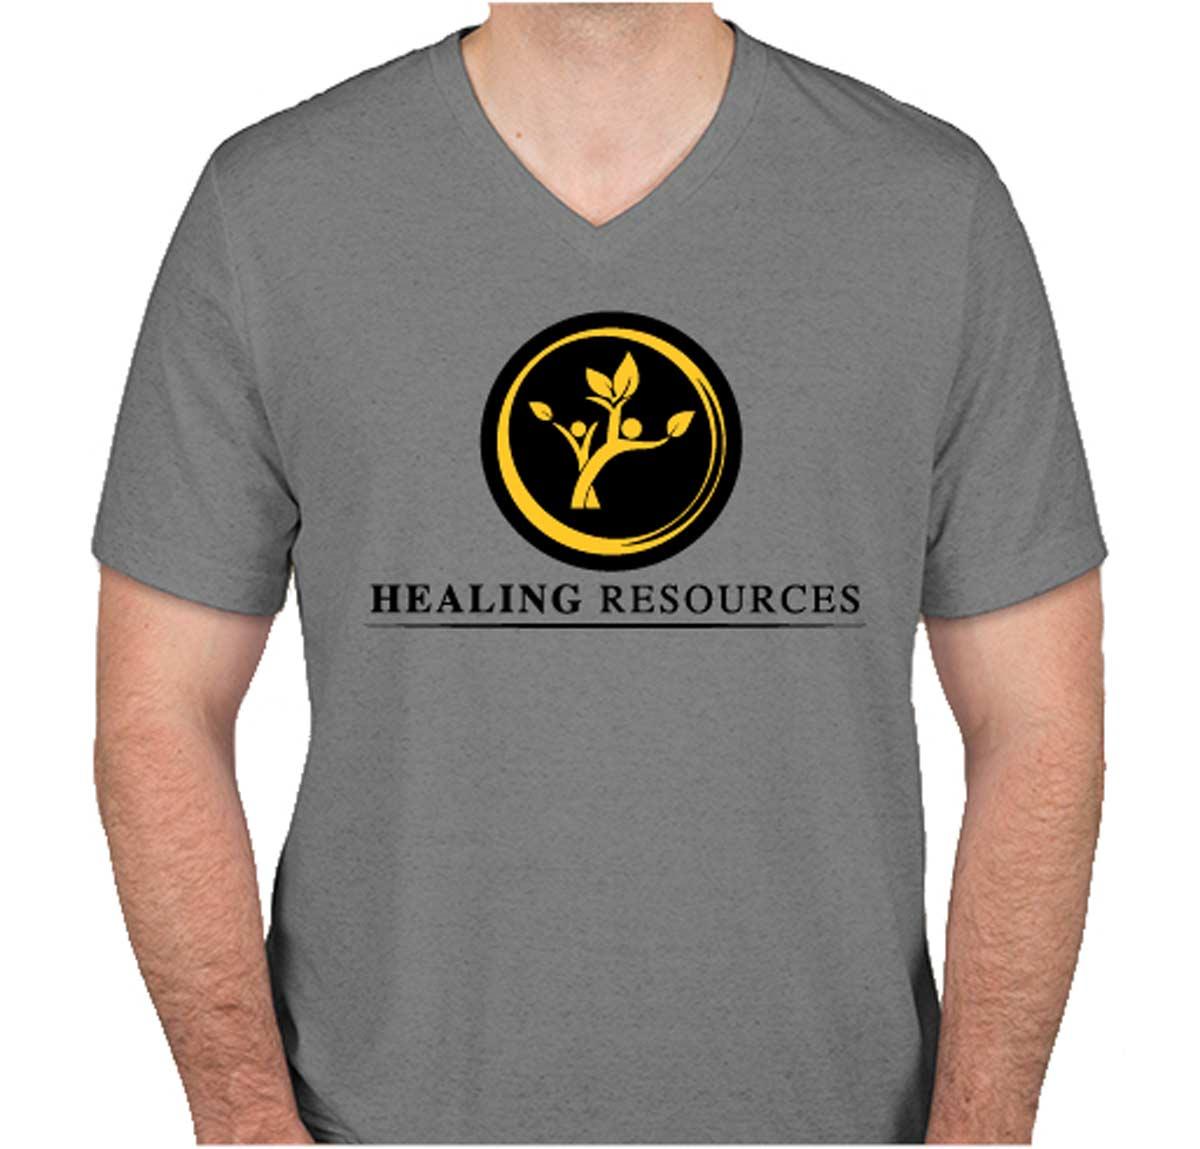 Healing Resources Men's V-Neck